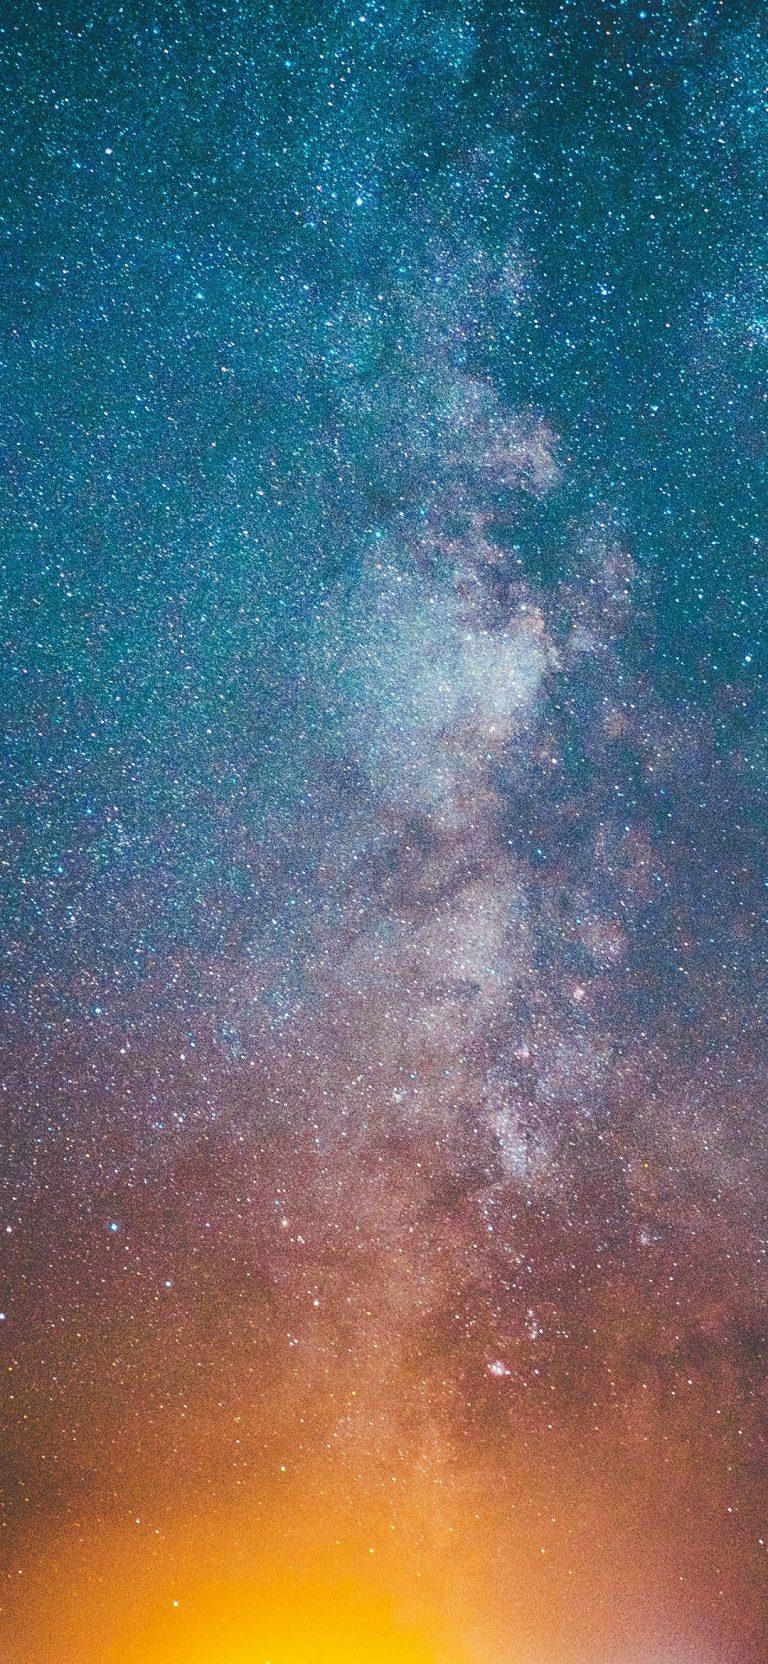 Space Phone Wallpaper 242 1080x2340 768x1664